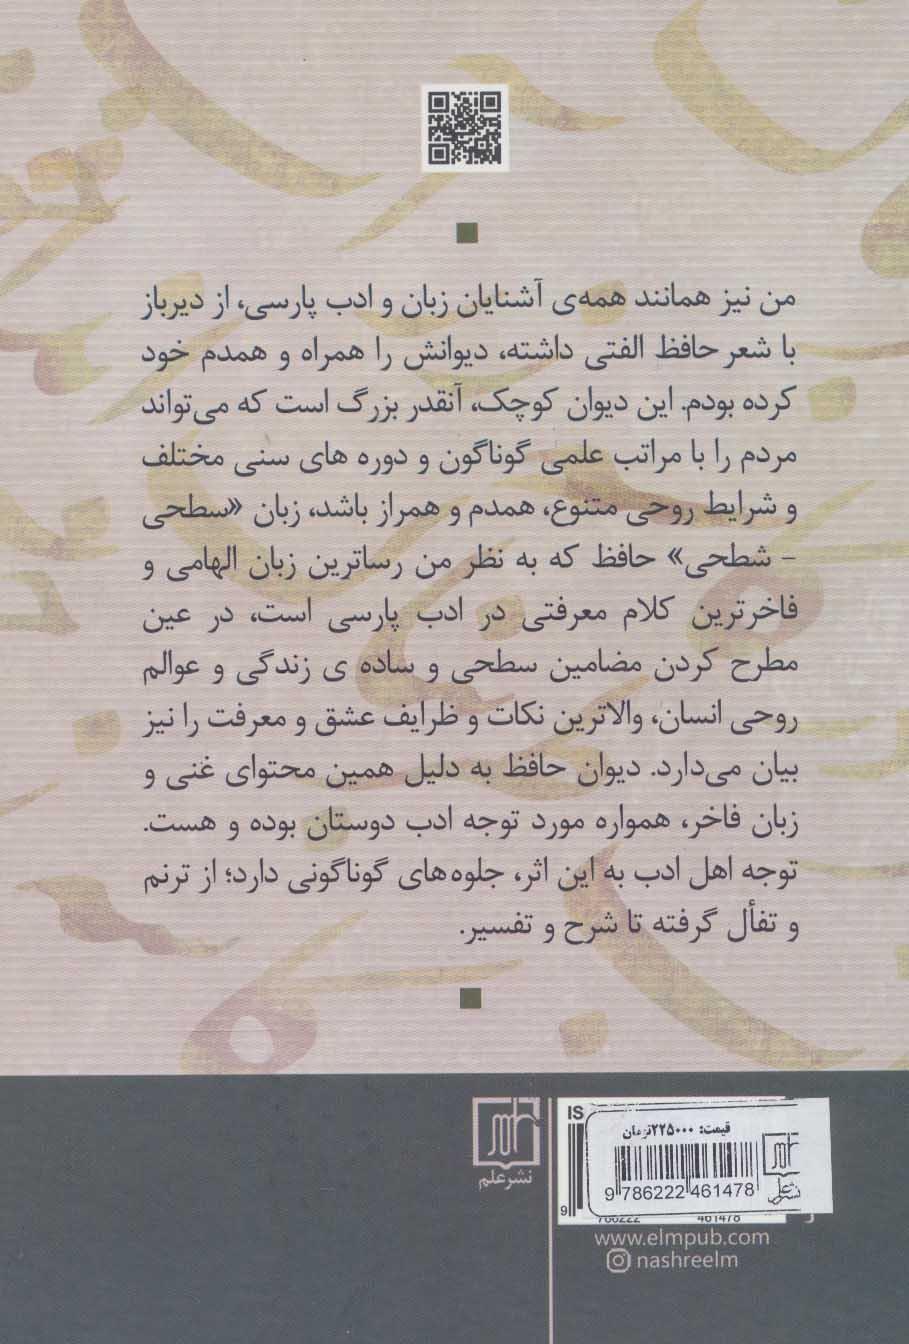 آب طربناک (تحلیل موضوعی دیوان حافظ)